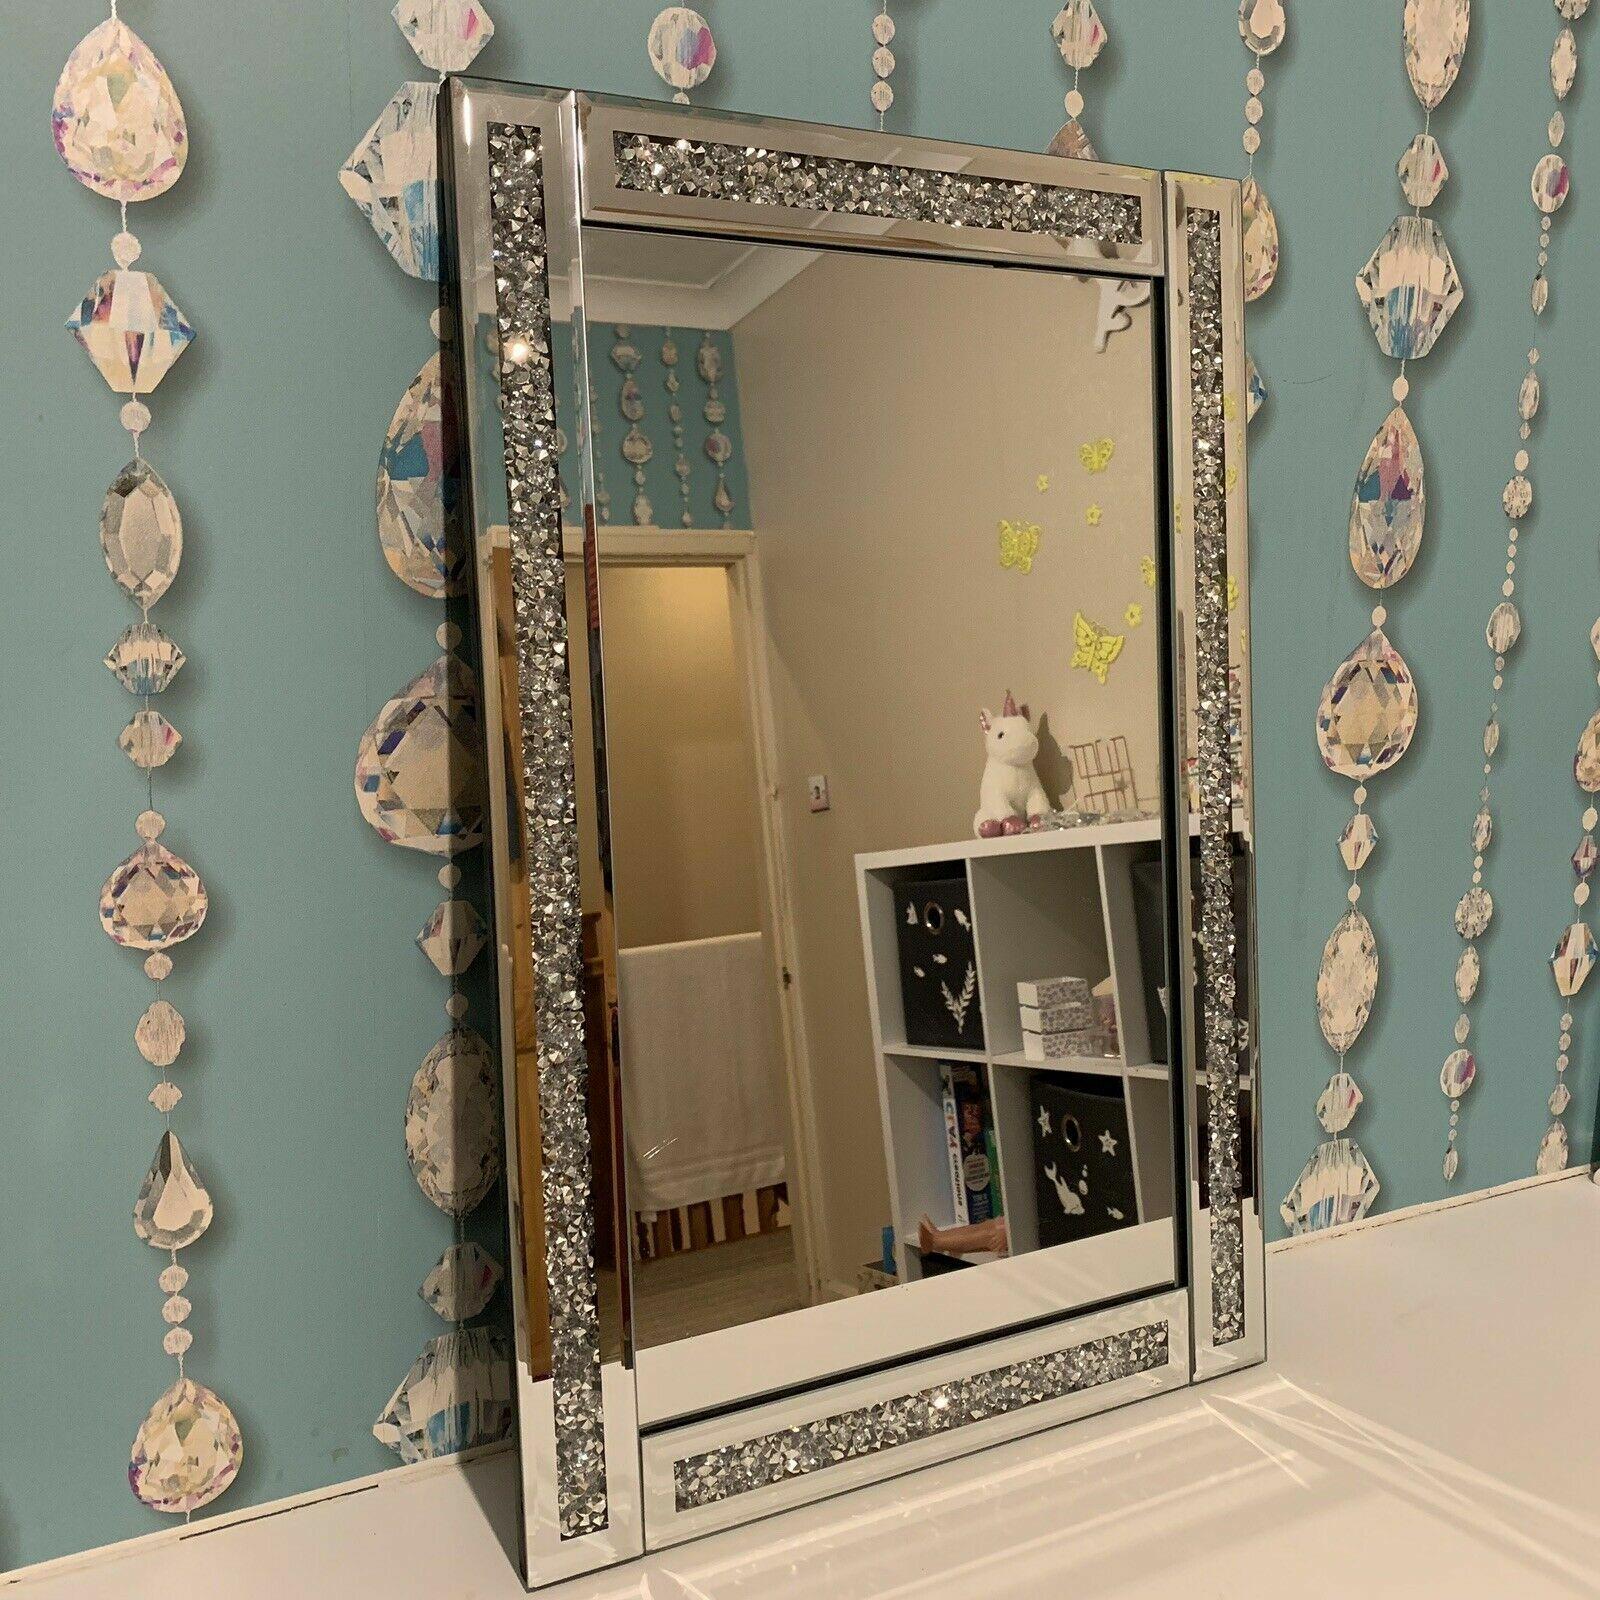 mirror - 40x60 Silver Diamante Wall Mirror Girls Bed Bath Room Bling Jewel Wall Mirror